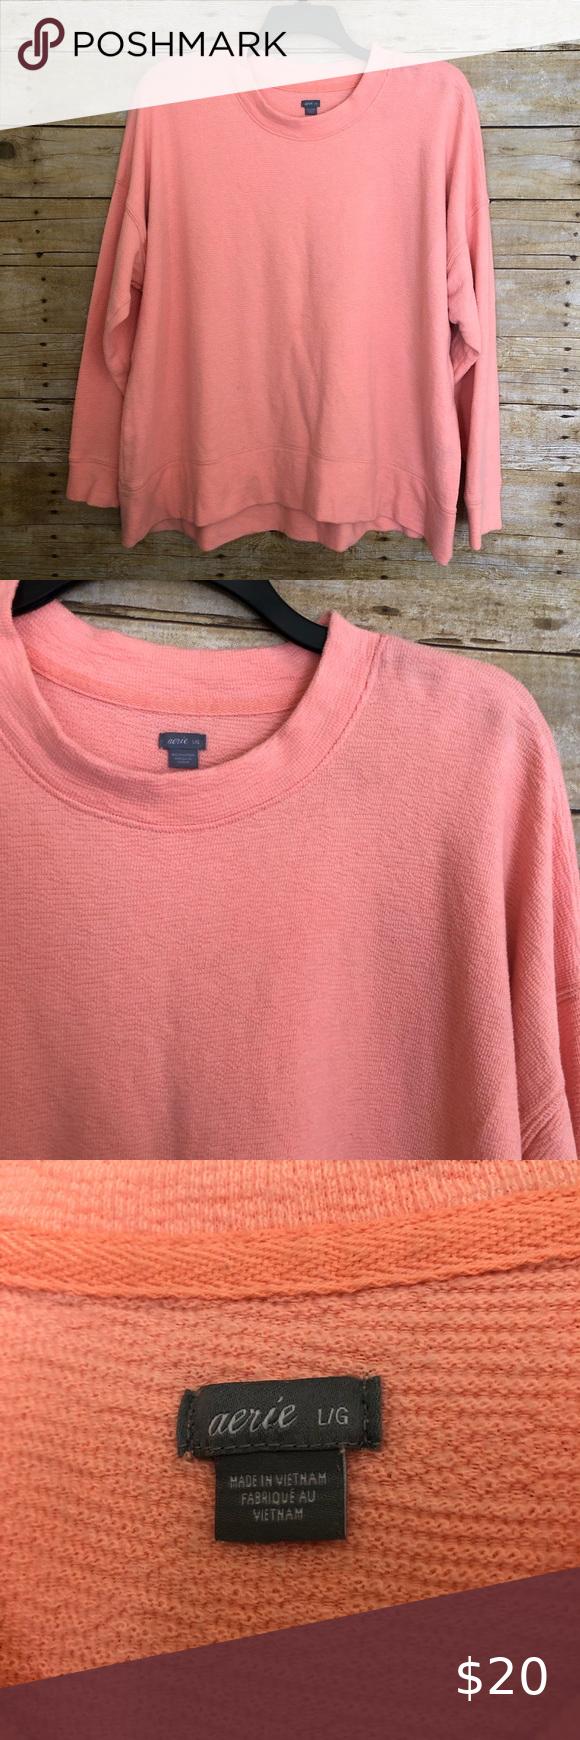 Aerie Peach Oversized Crew Neck Sweatshirt Women S Oversized Sweatshirt By Aerie This Peach Colored Sweatshirts Crewneck Sweatshirt Women Crew Neck Sweatshirt [ 1740 x 580 Pixel ]